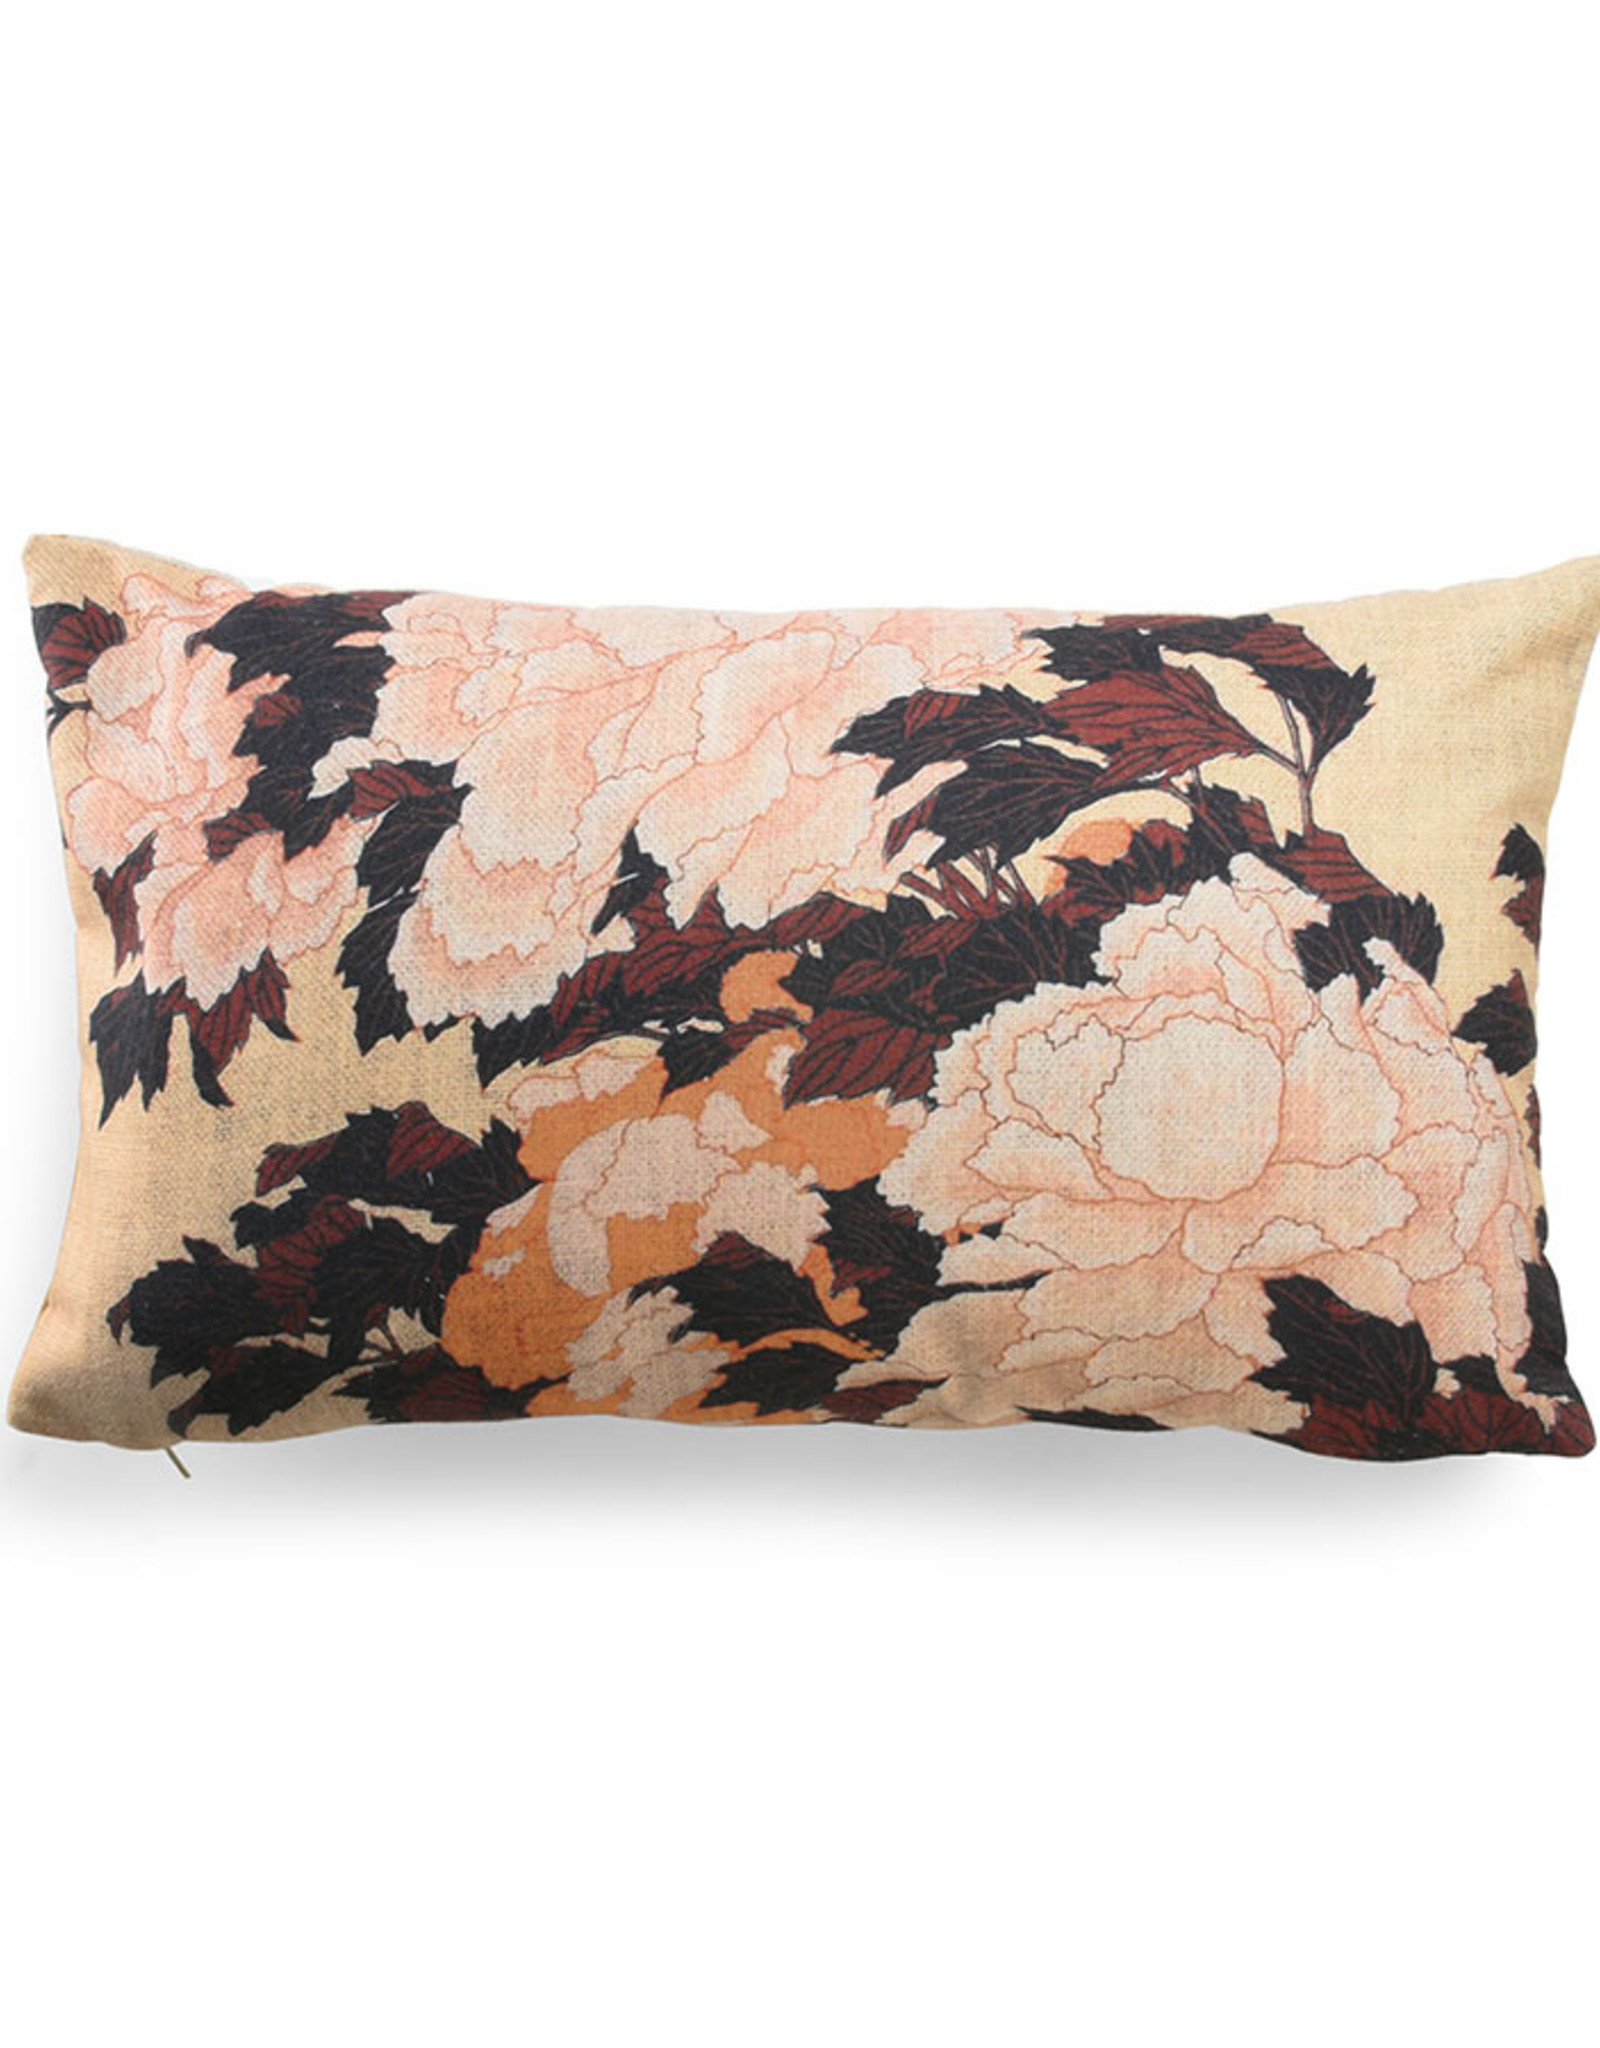 HK living Printed cushion tokyo 35x60cm